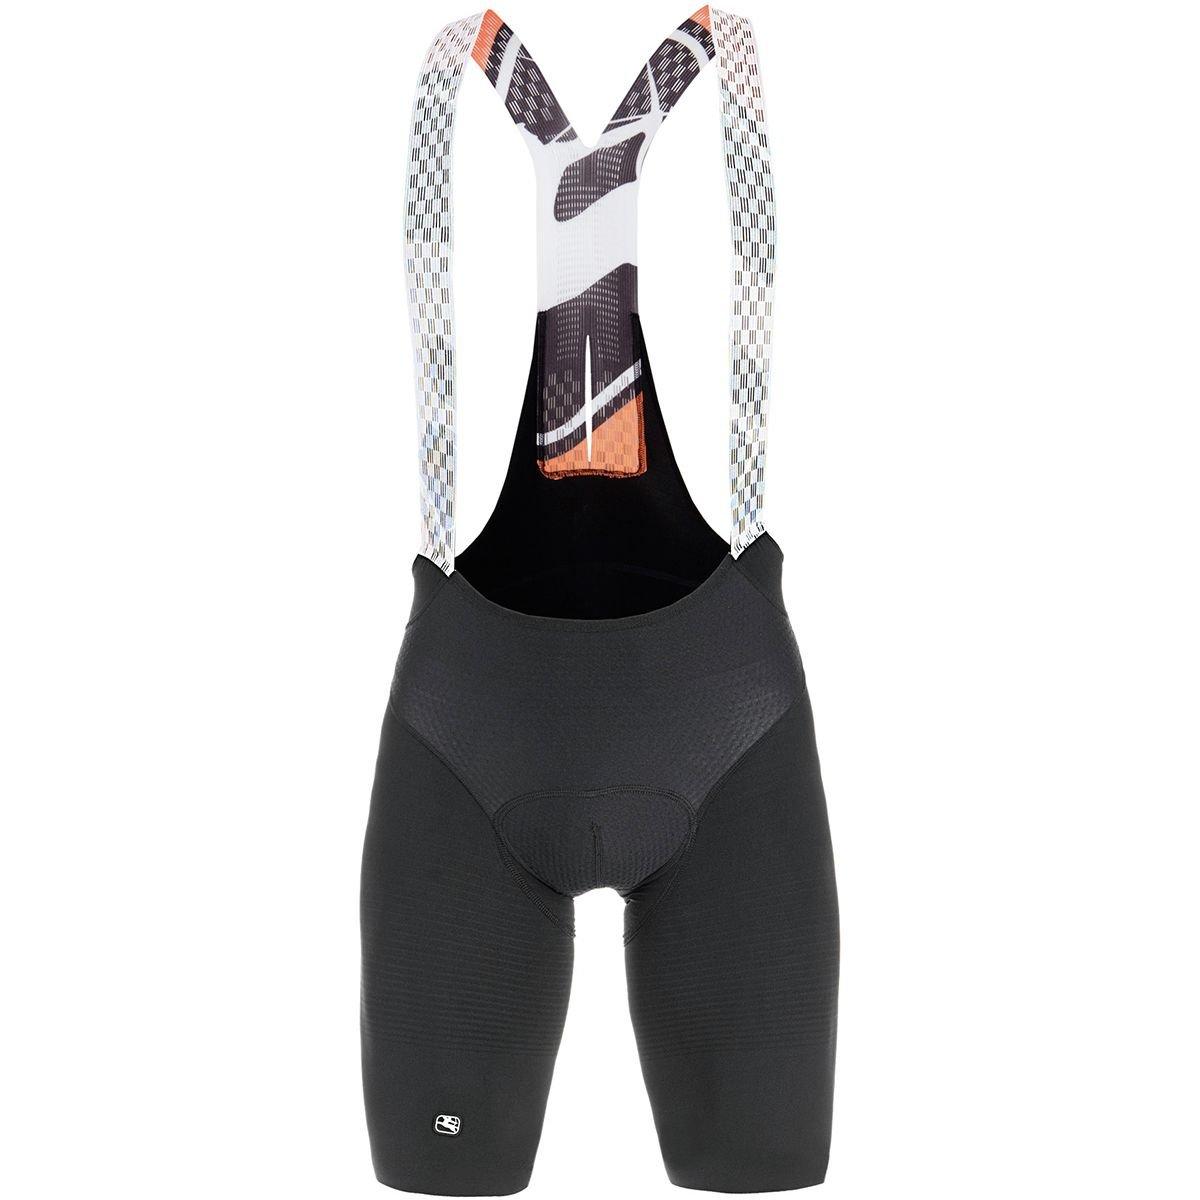 Giordana NX-G Bib Shorts with Cirro-S Insert - Men's Black, M